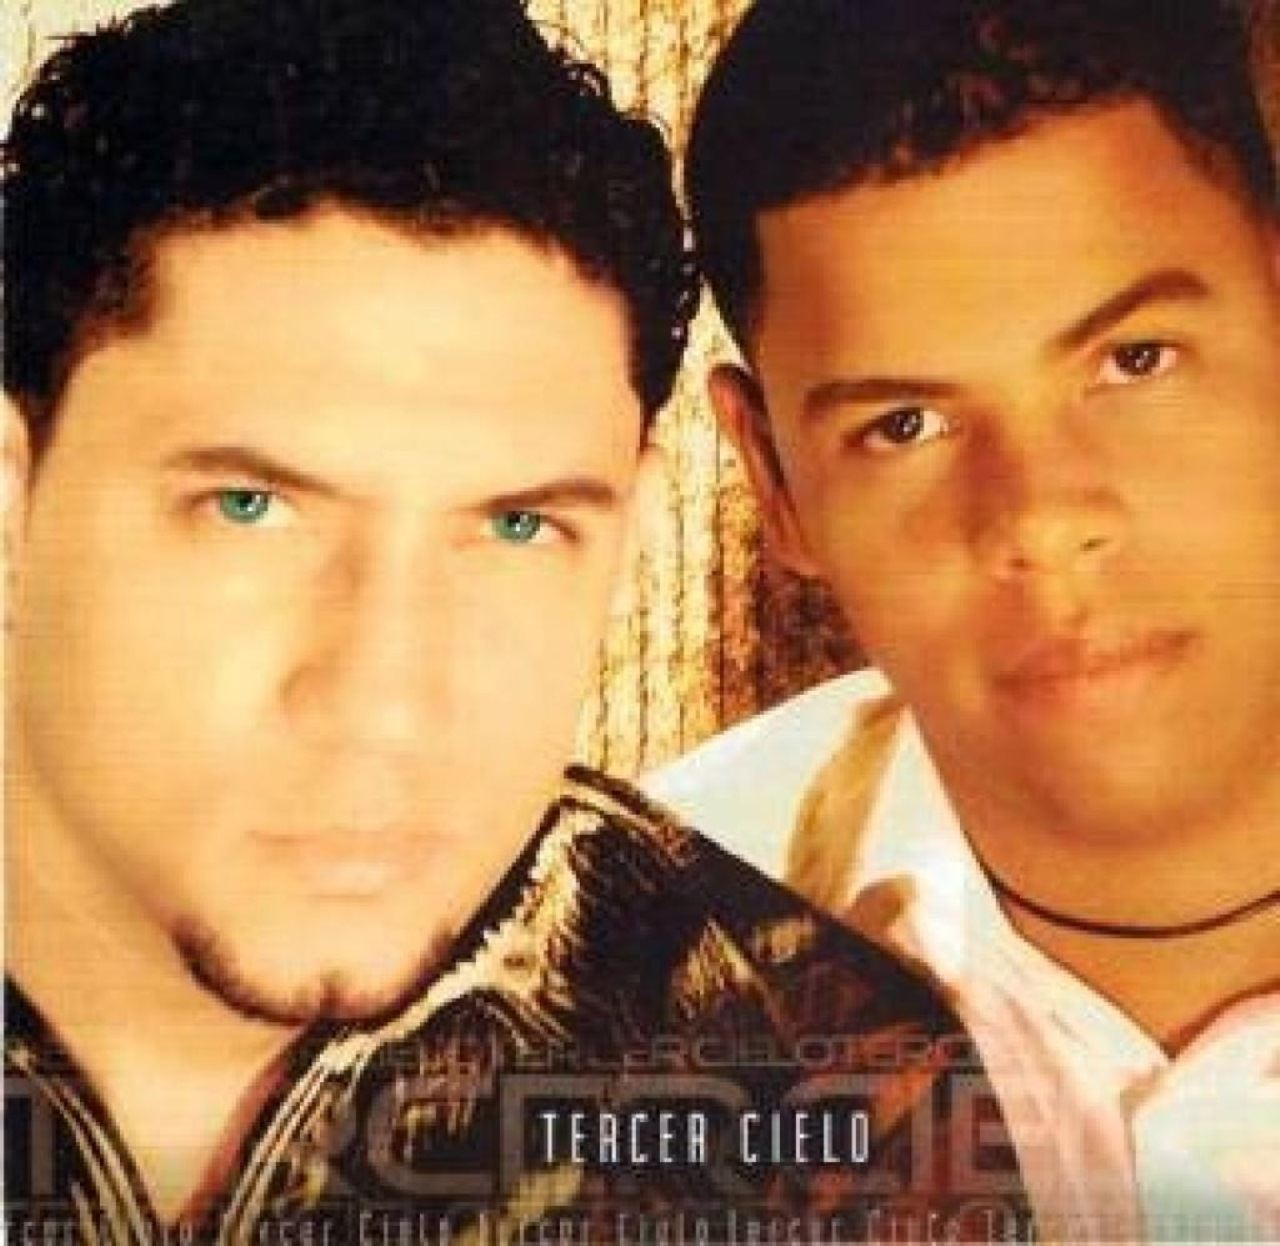 Tercer Cielo, álbum Primer amor